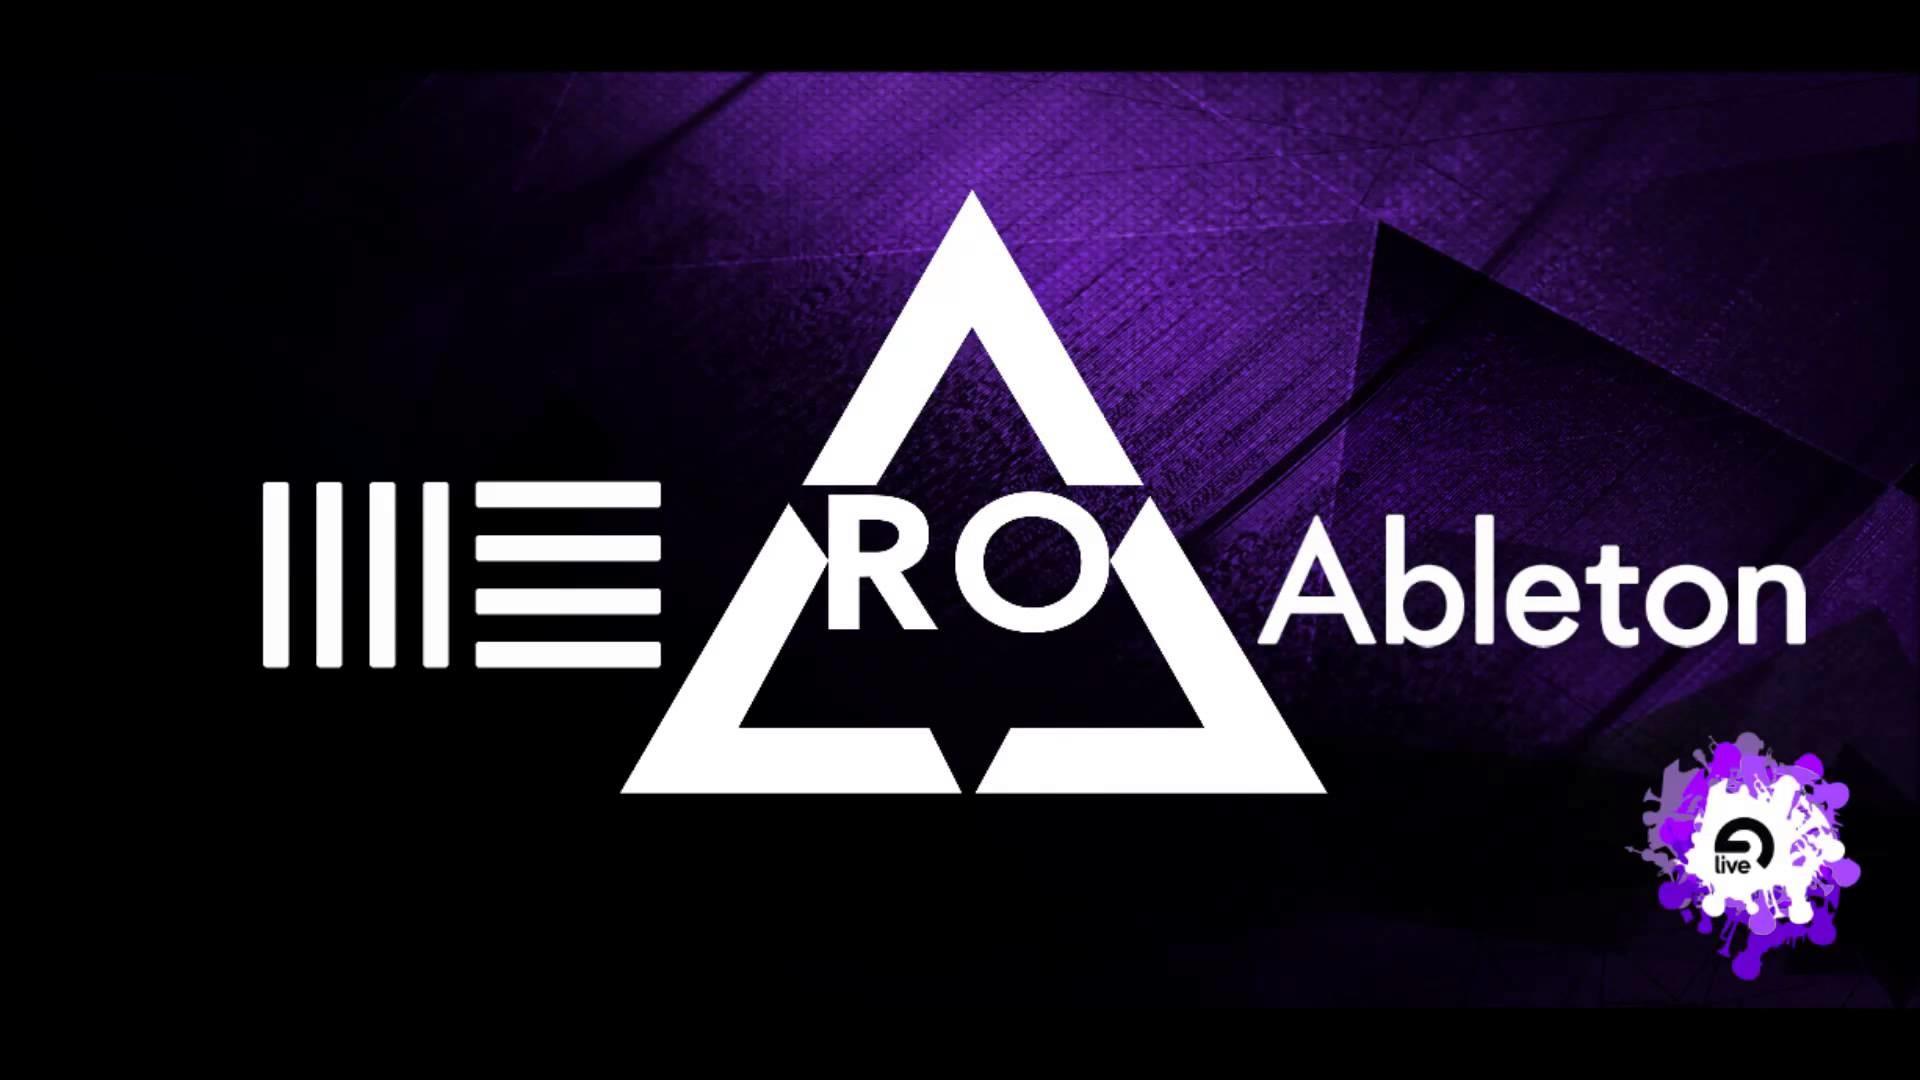 CREACION EN ABLETON LIVE 9 12 DE OCTUBRE 2014